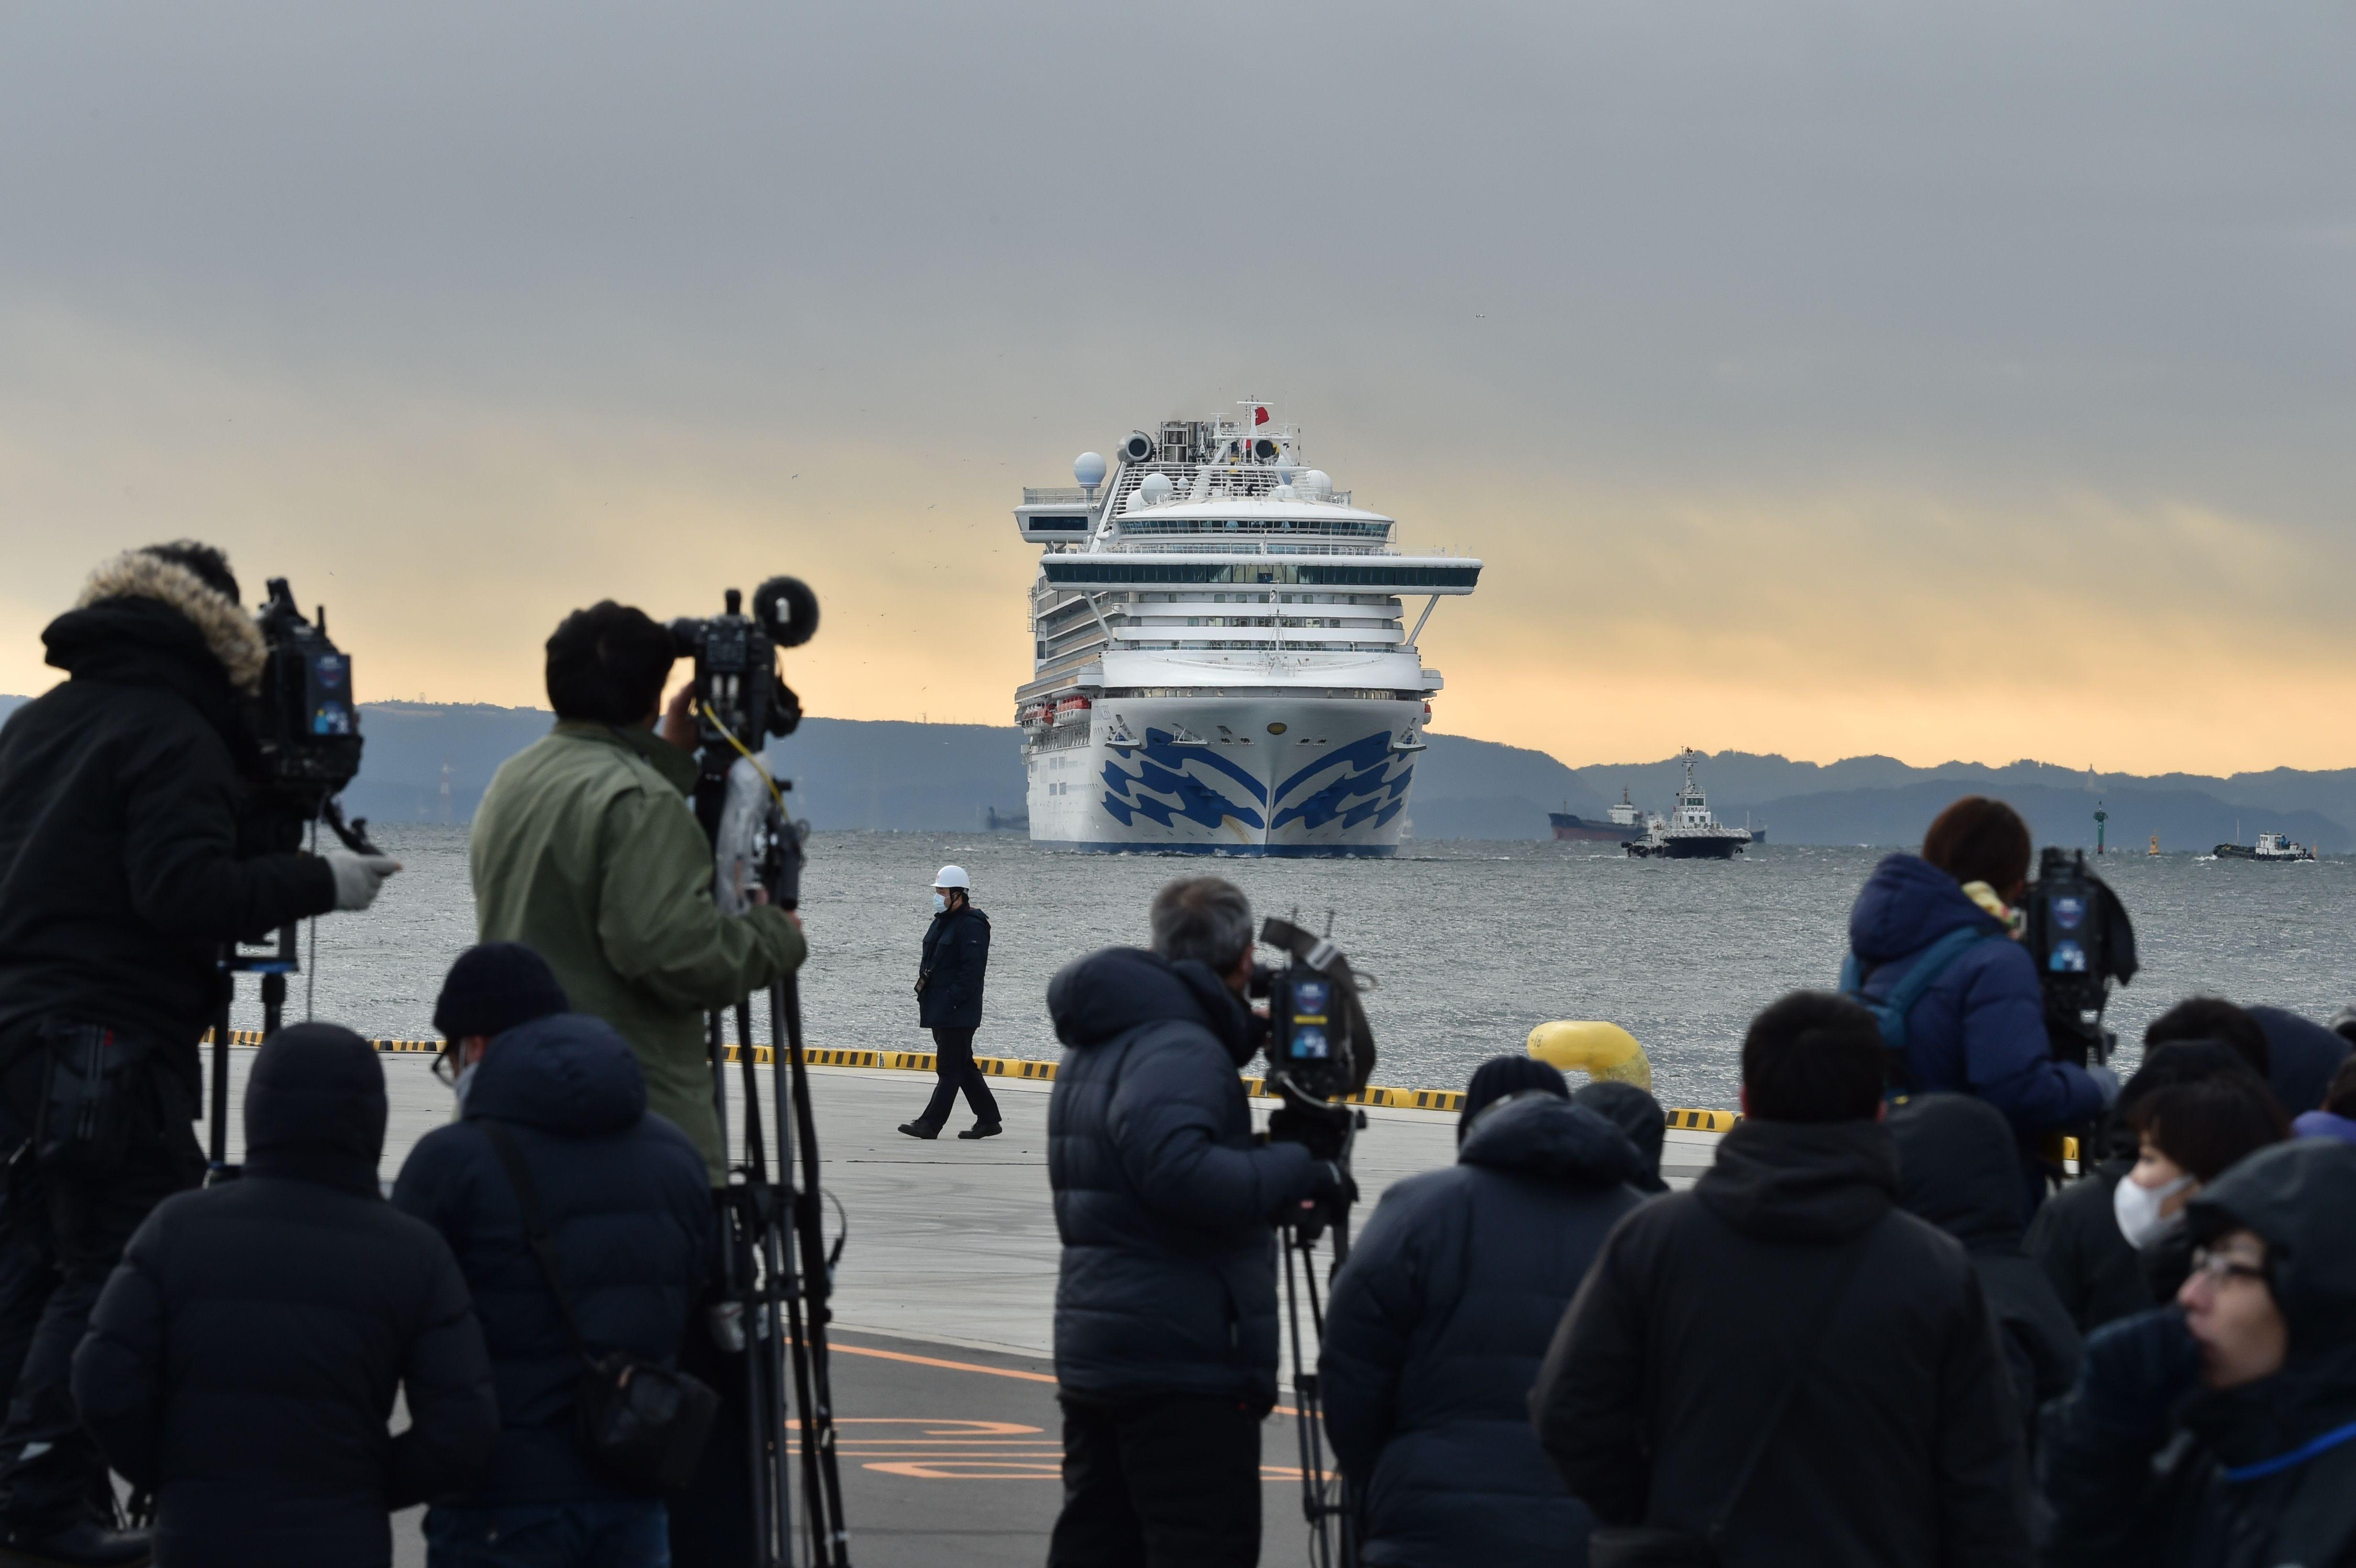 Princess Cruise passengers quarantined after coronavirus outbreak on board